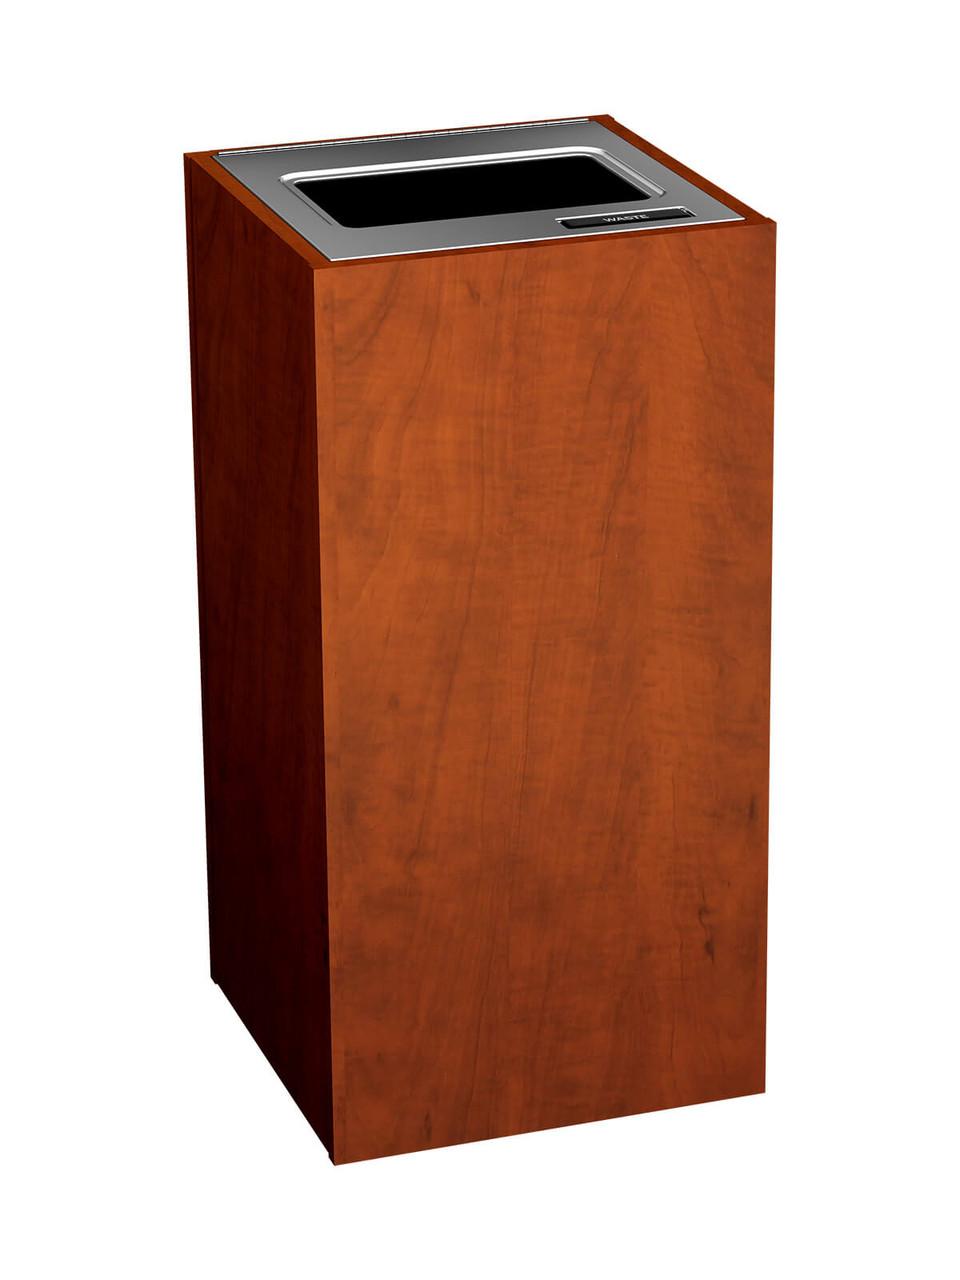 1 Stream 23 Gallon Aristata Tier 3 Recycling Bin 90917 MidSummer Flame